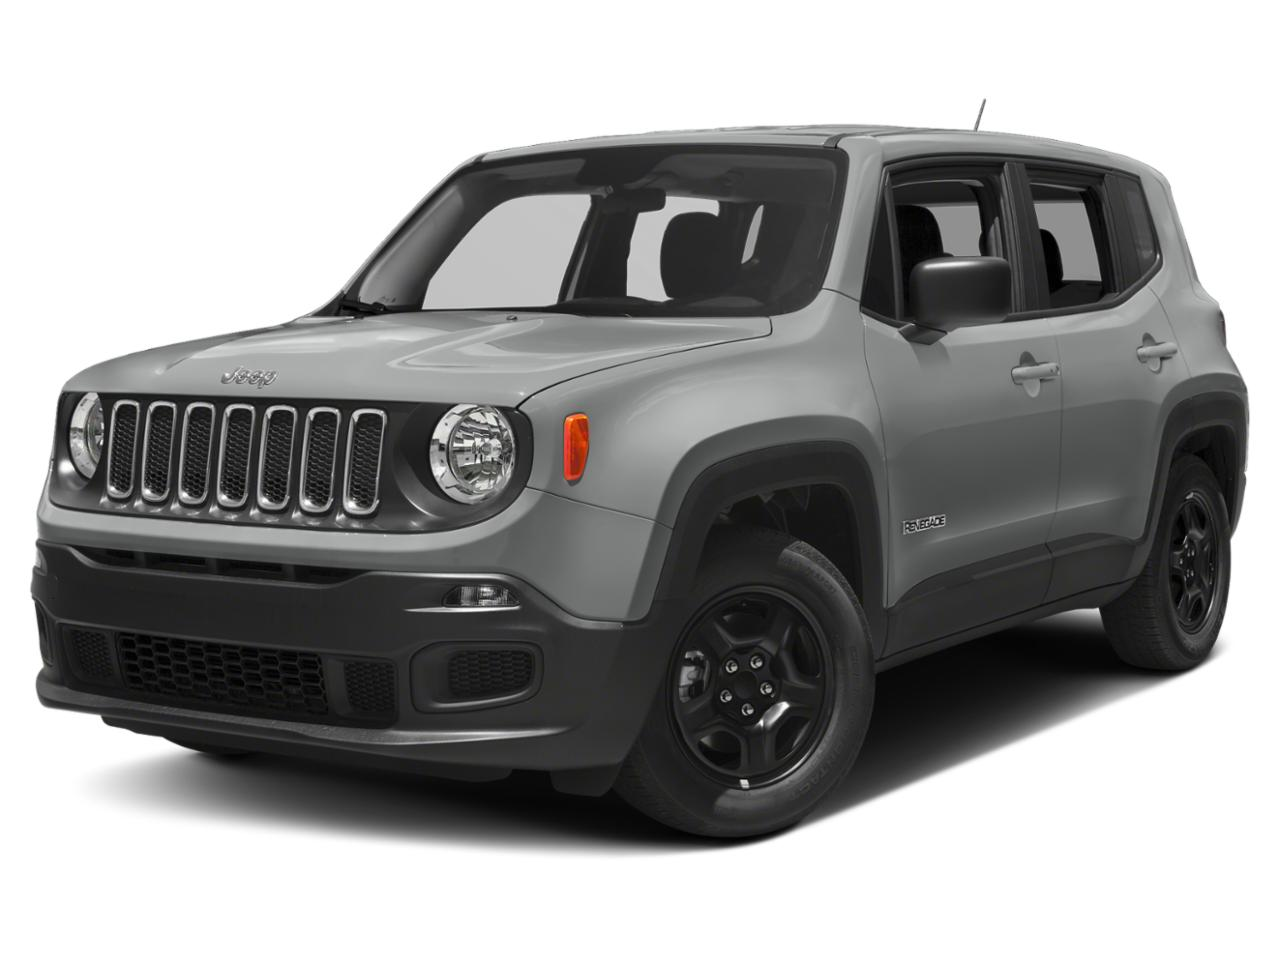 2018 Jeep Renegade Vehicle Photo in MERRIAM, KS 66202